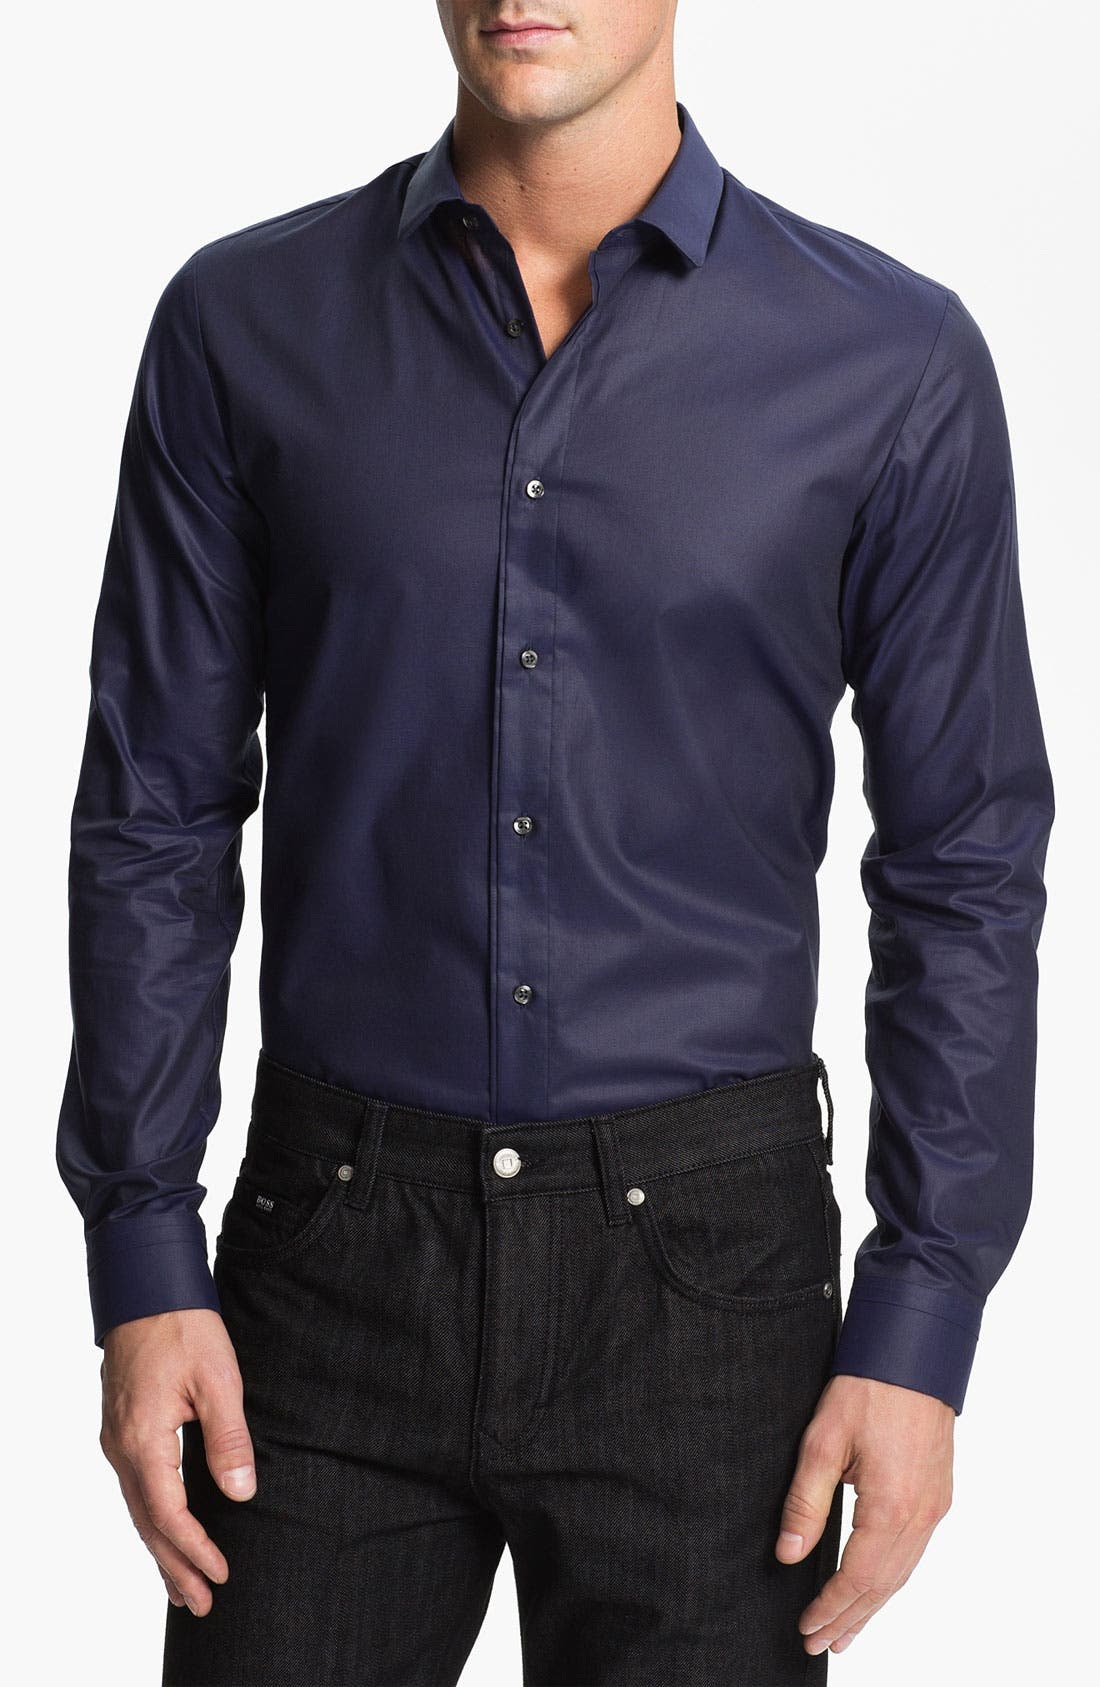 Alternate Image 1 Selected - HUGO 'Etti' Slim Fit Sport Shirt